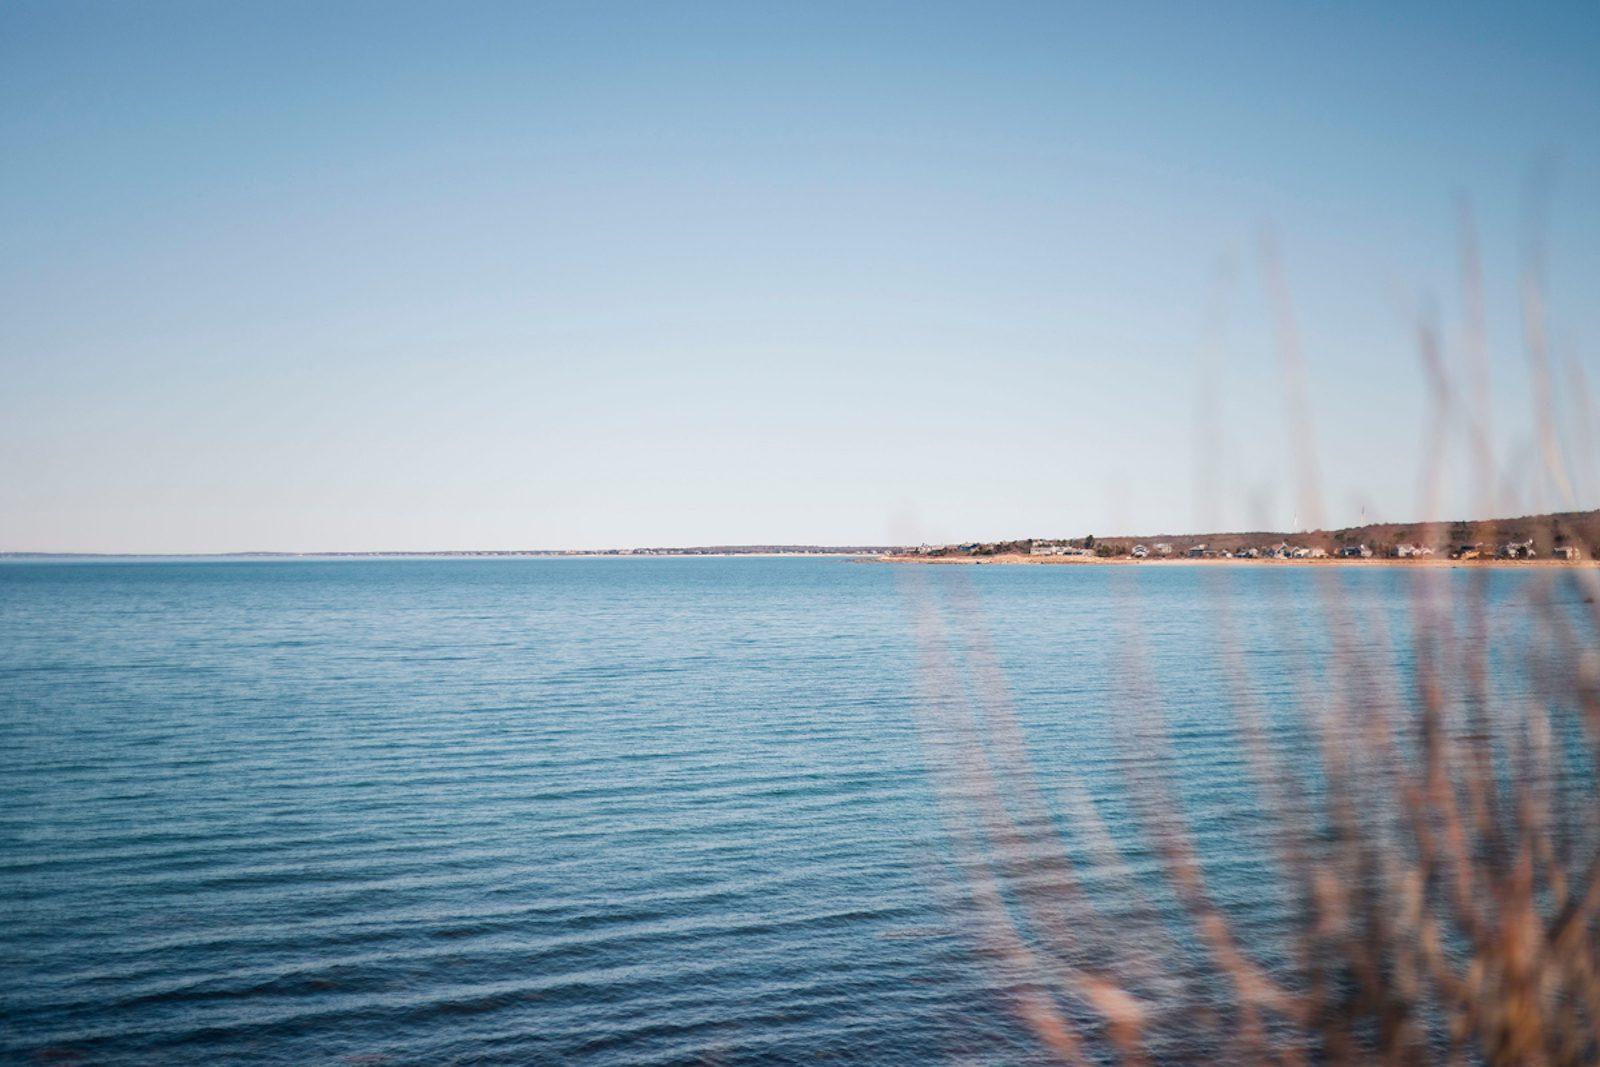 Cape Cod, MA